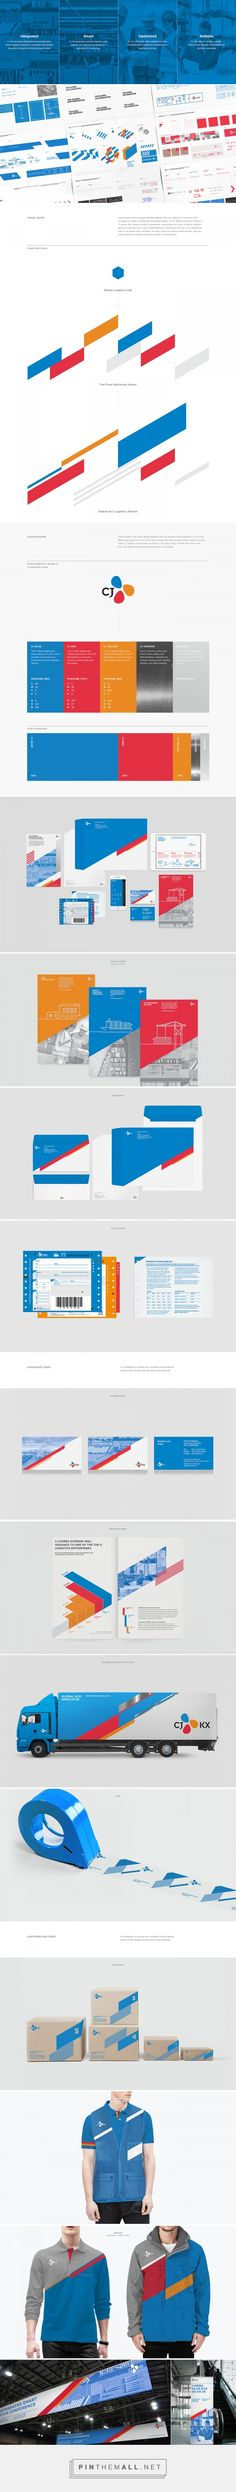 CJ KX Brand eXperience Design Renewal on Behance - created via https://pinthemall.net